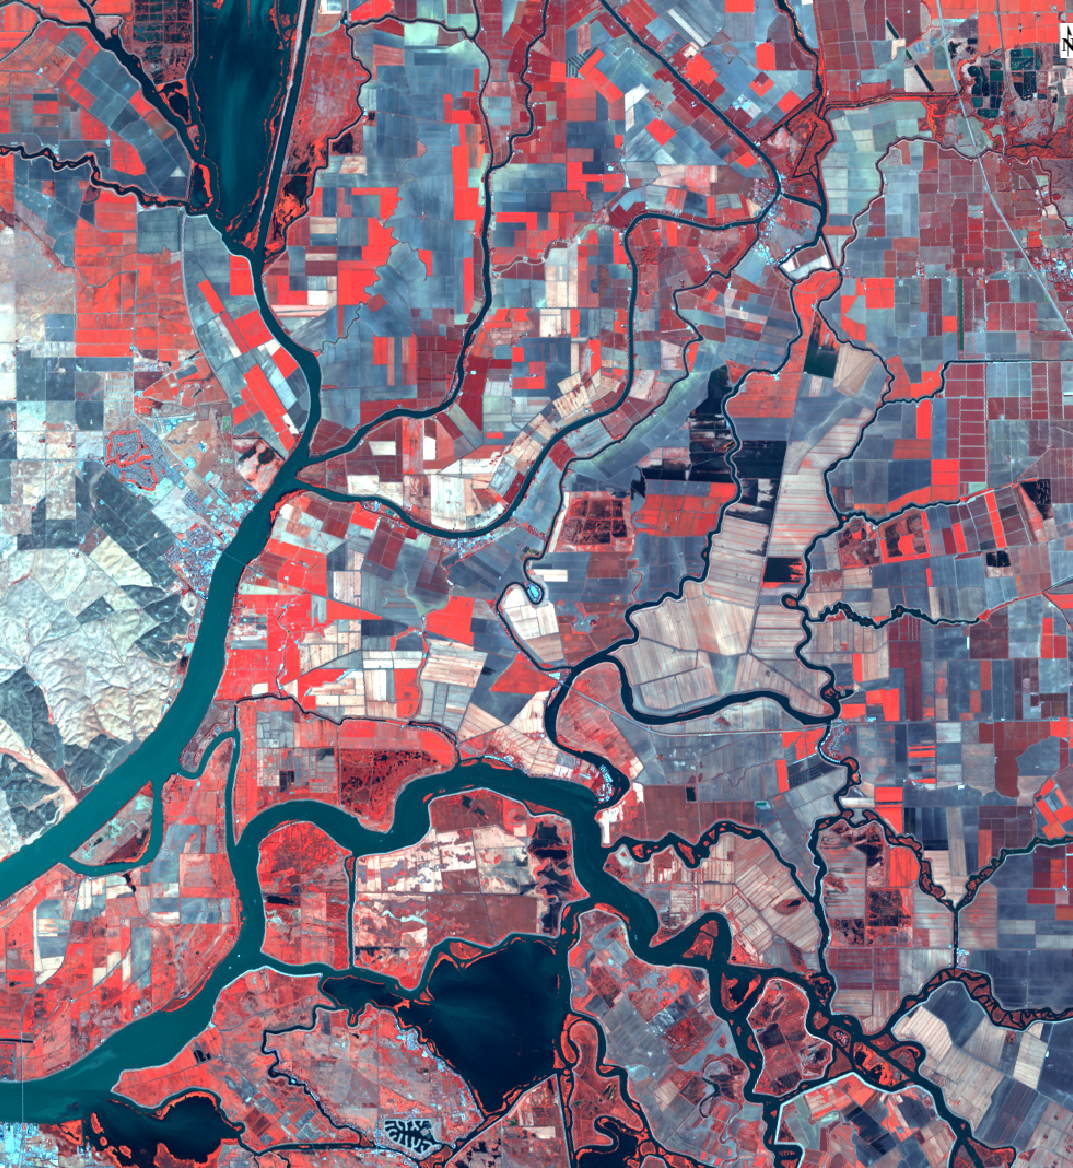 Sacramento-San Joaquin Delta, color infrared (image: R Pauloo)